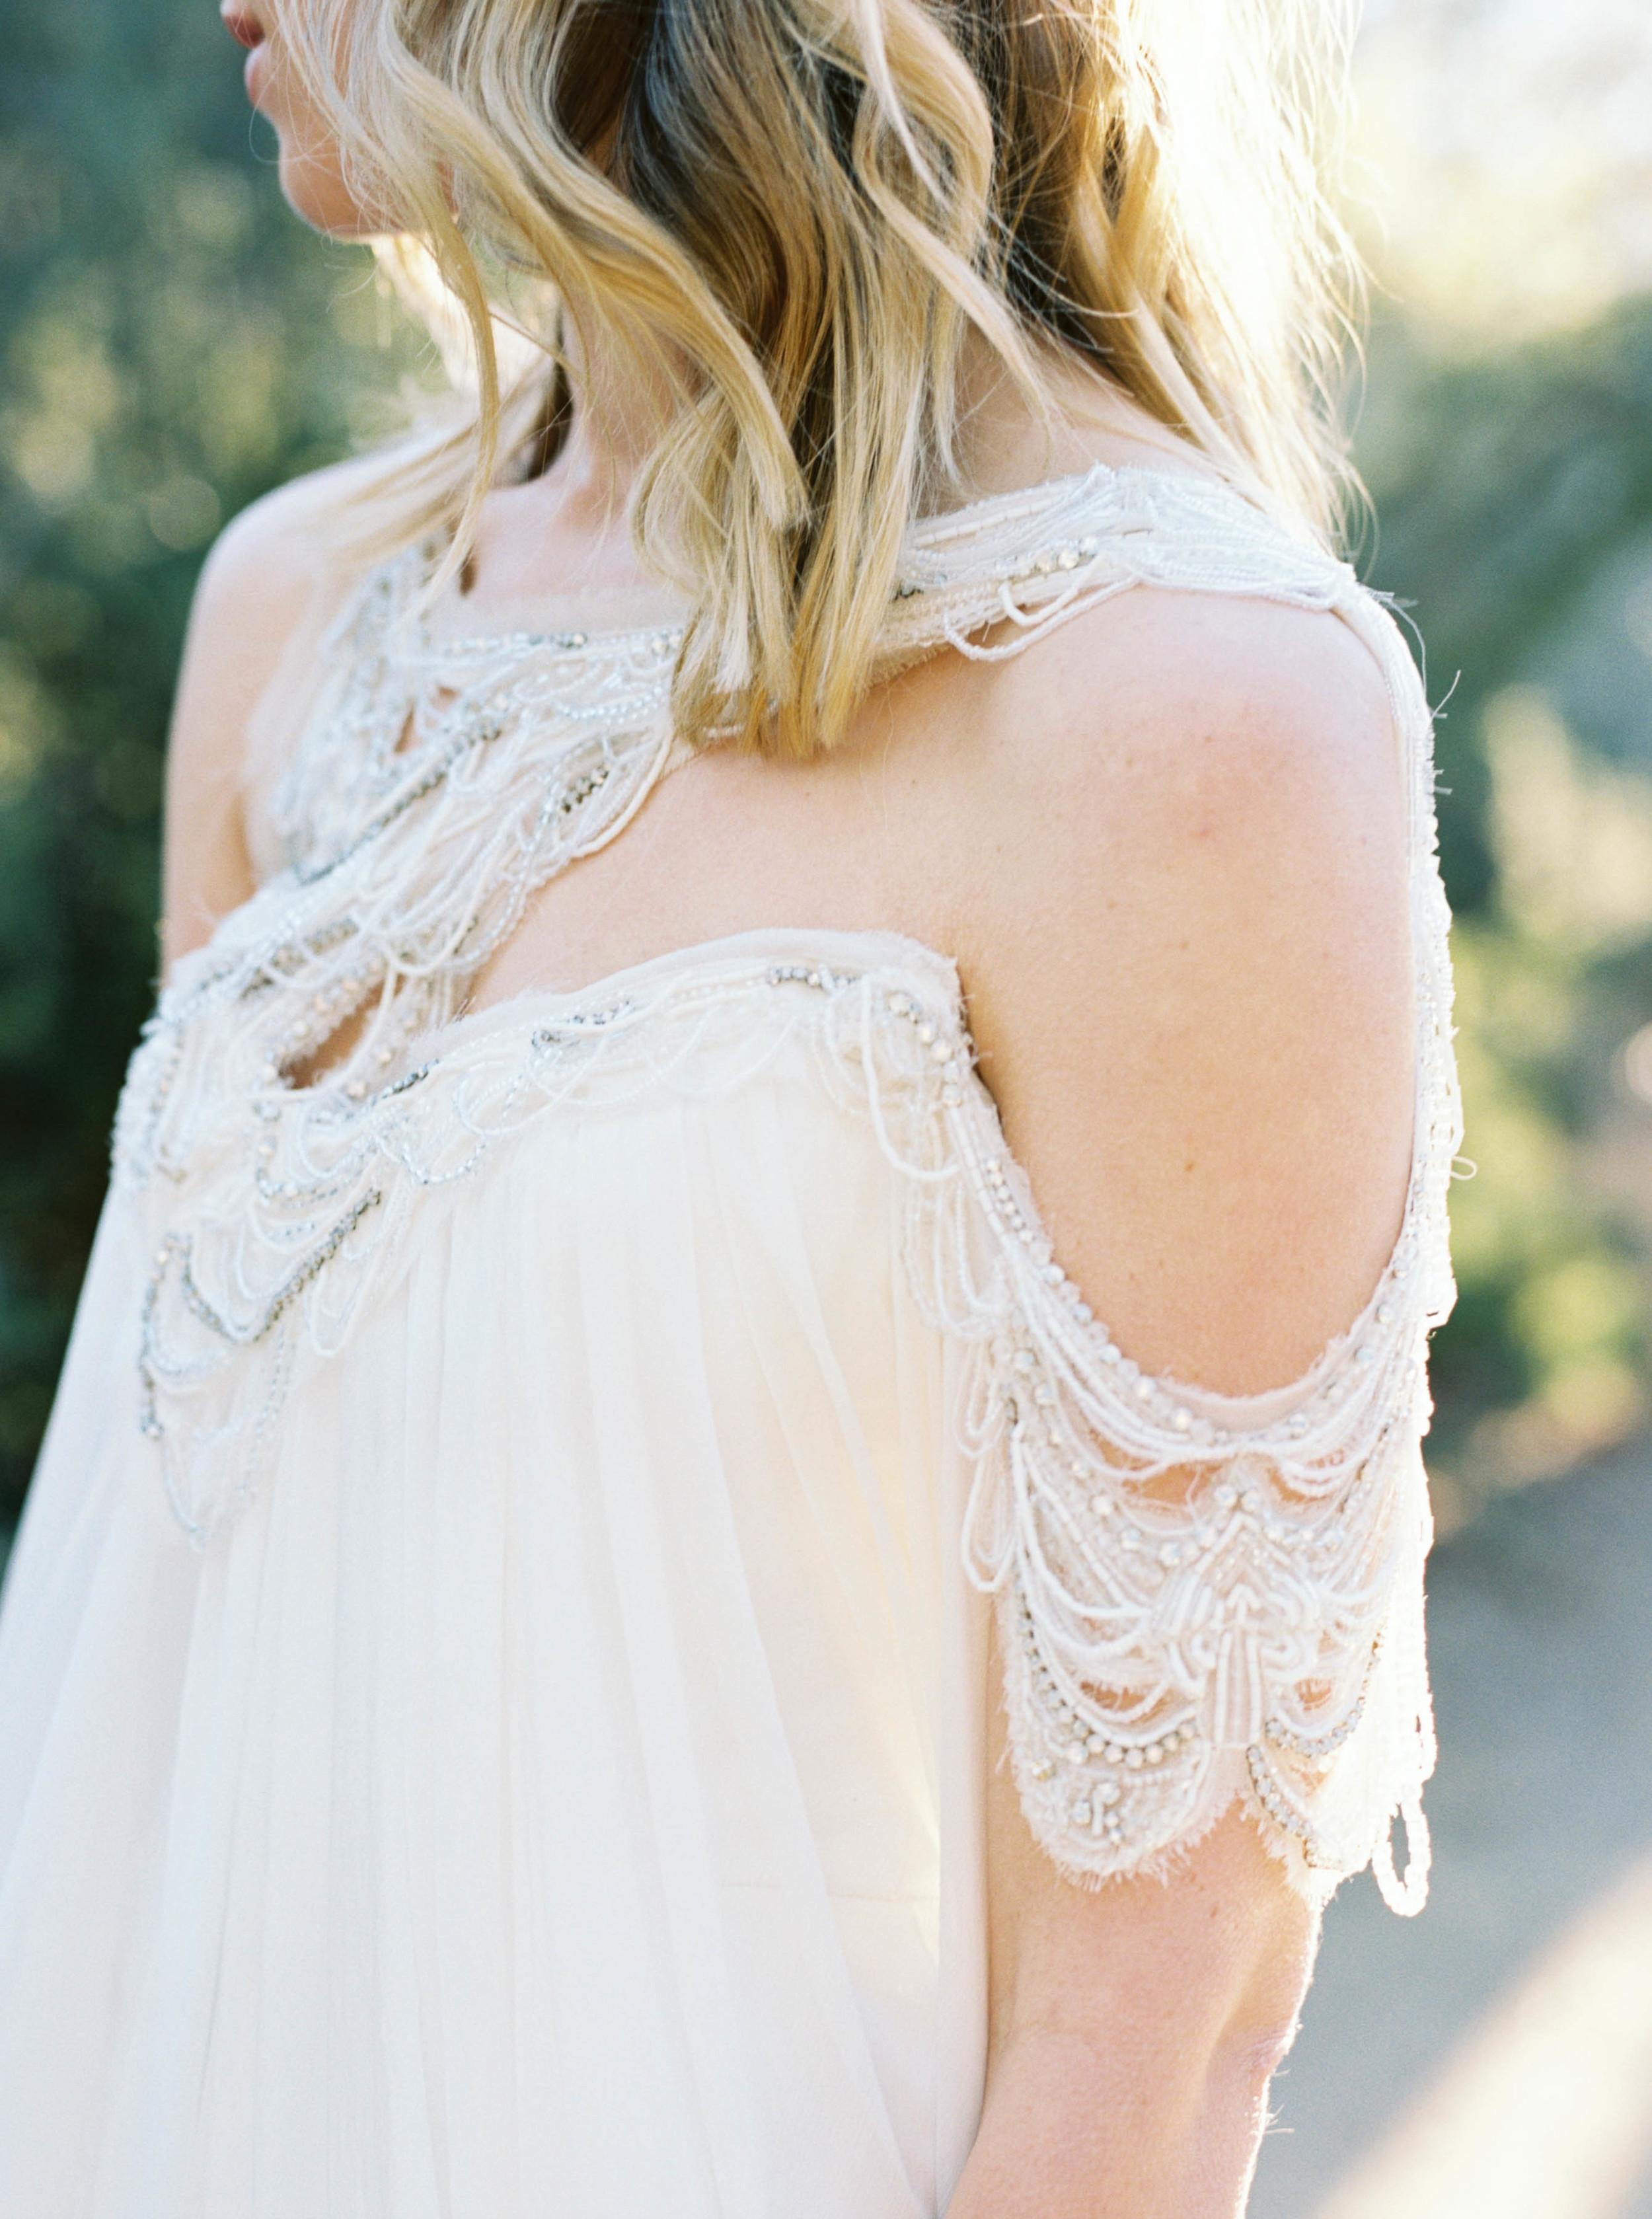 Danford-Photography-Bozeman-Montana-Arizona-Fine Art Film-Wedding-Engagement-Photographers-8.jpg